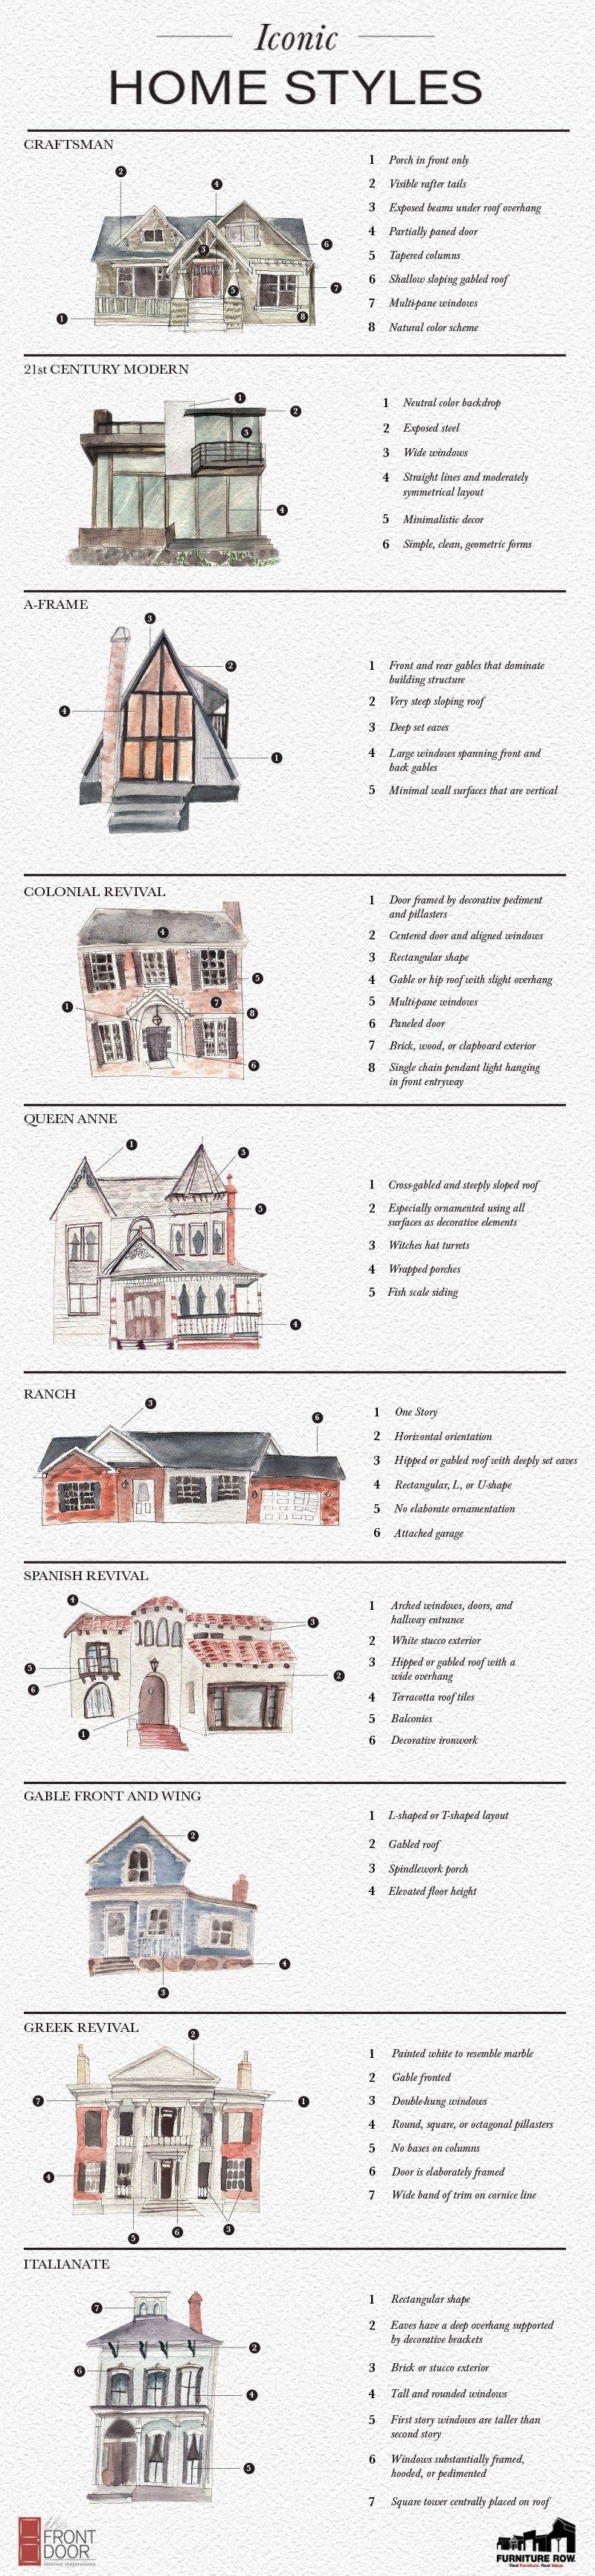 iconic home styles arquitectura casas y planos